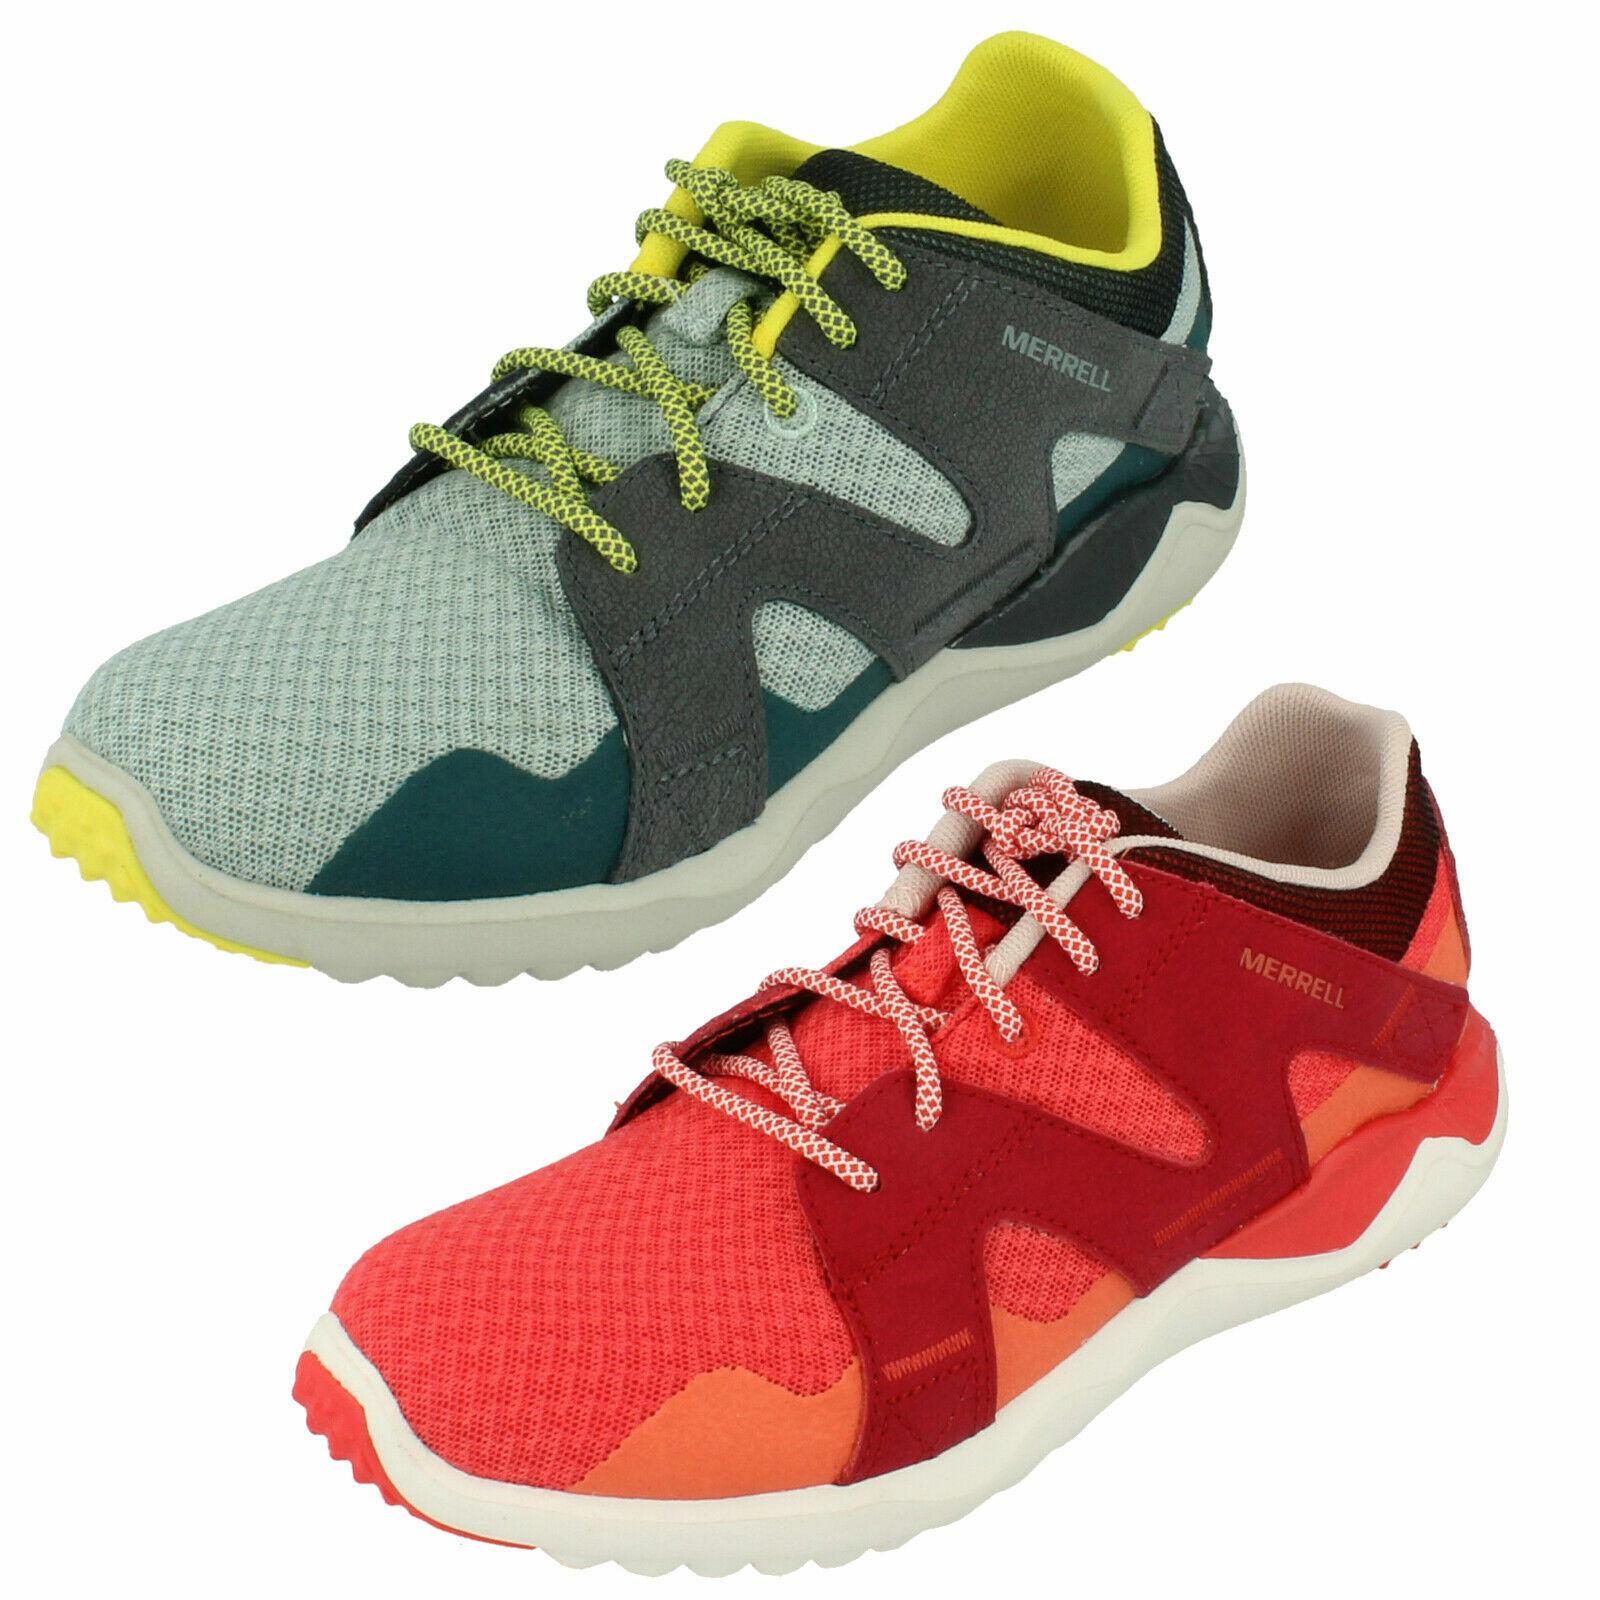 Femmes Merrell 1SIX8 Léger Maille chaussures Marche Baskets Taille J03274 J03278